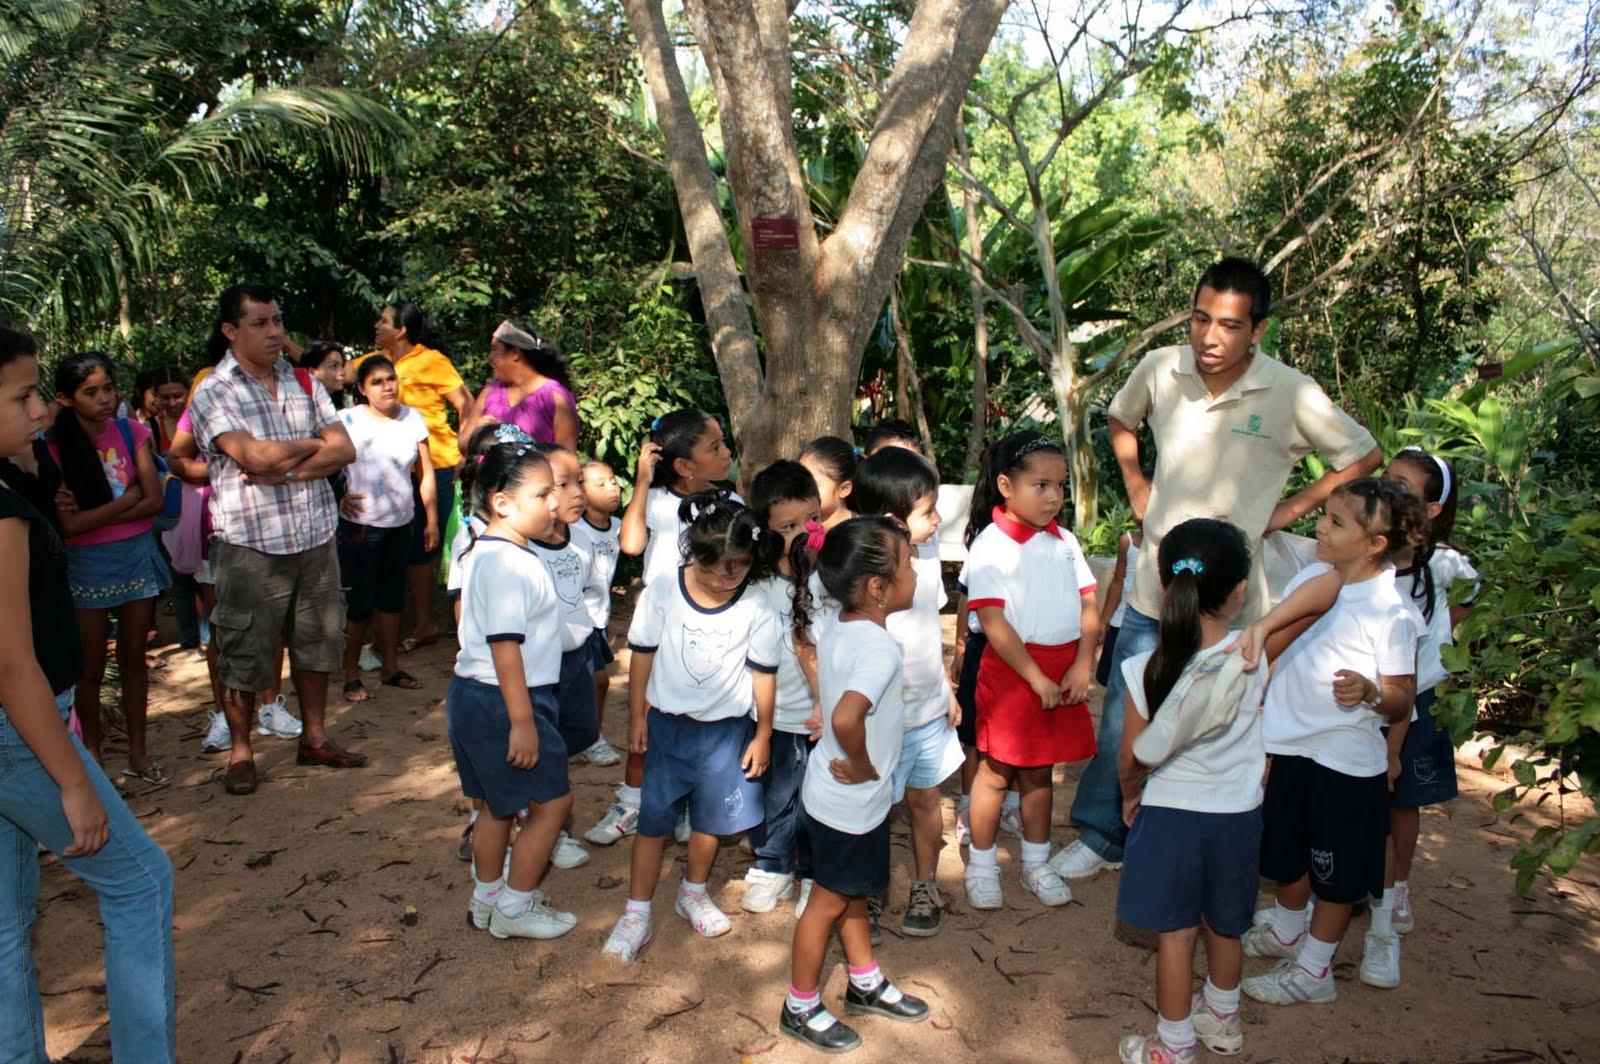 Jardin lucia alcocer acapulco excursi n al jardin for Talleres jardin botanico